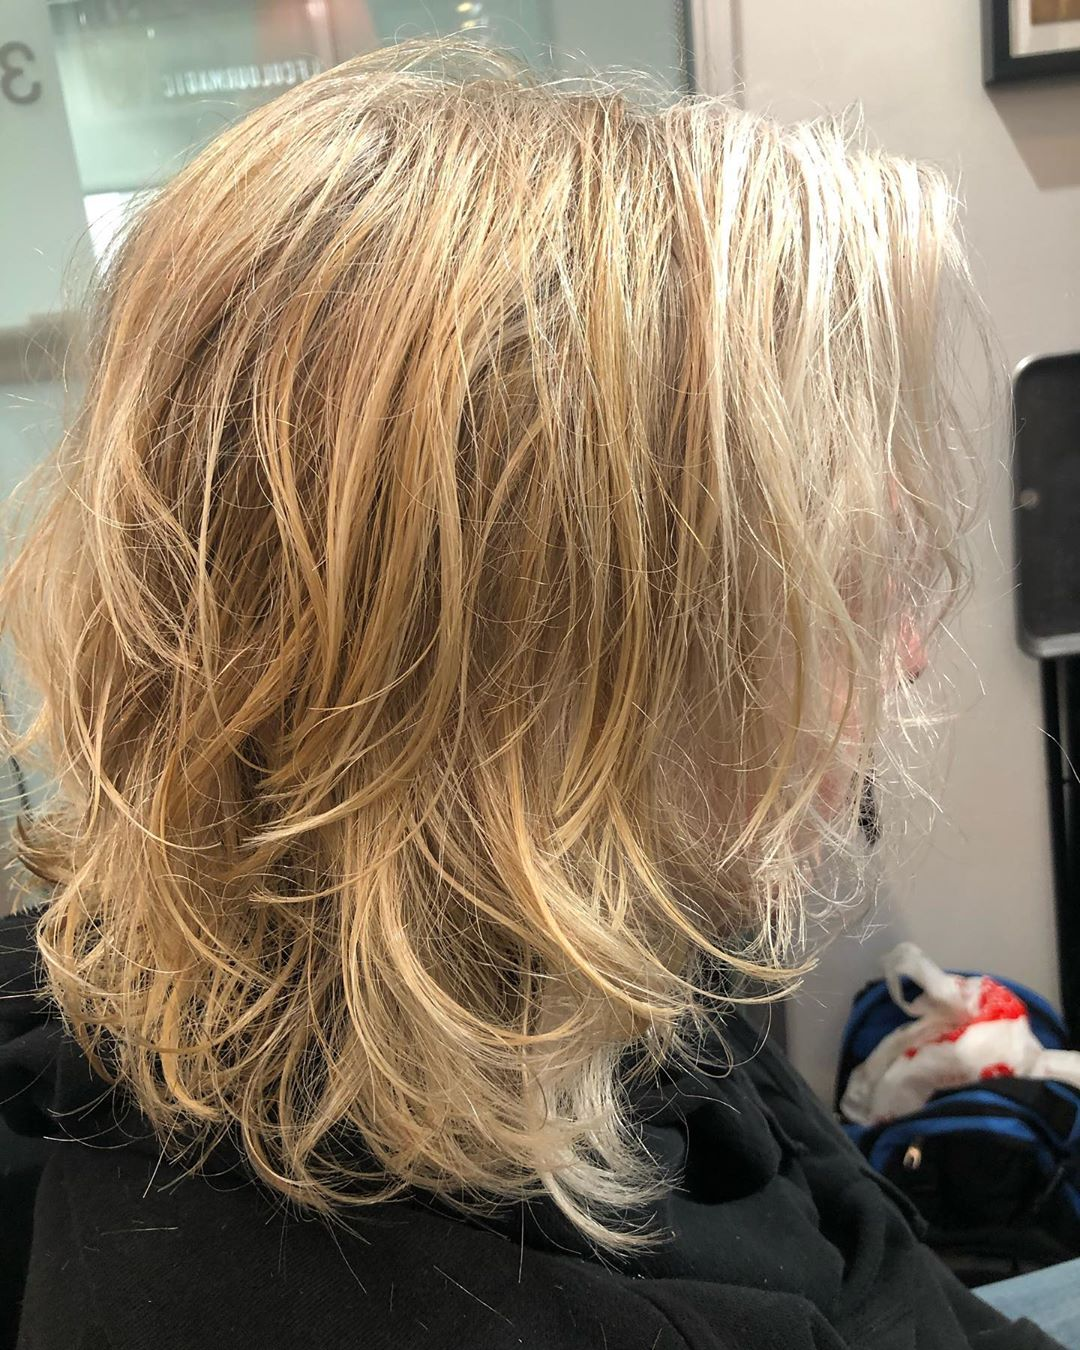 Layered lowlights on blonde hair